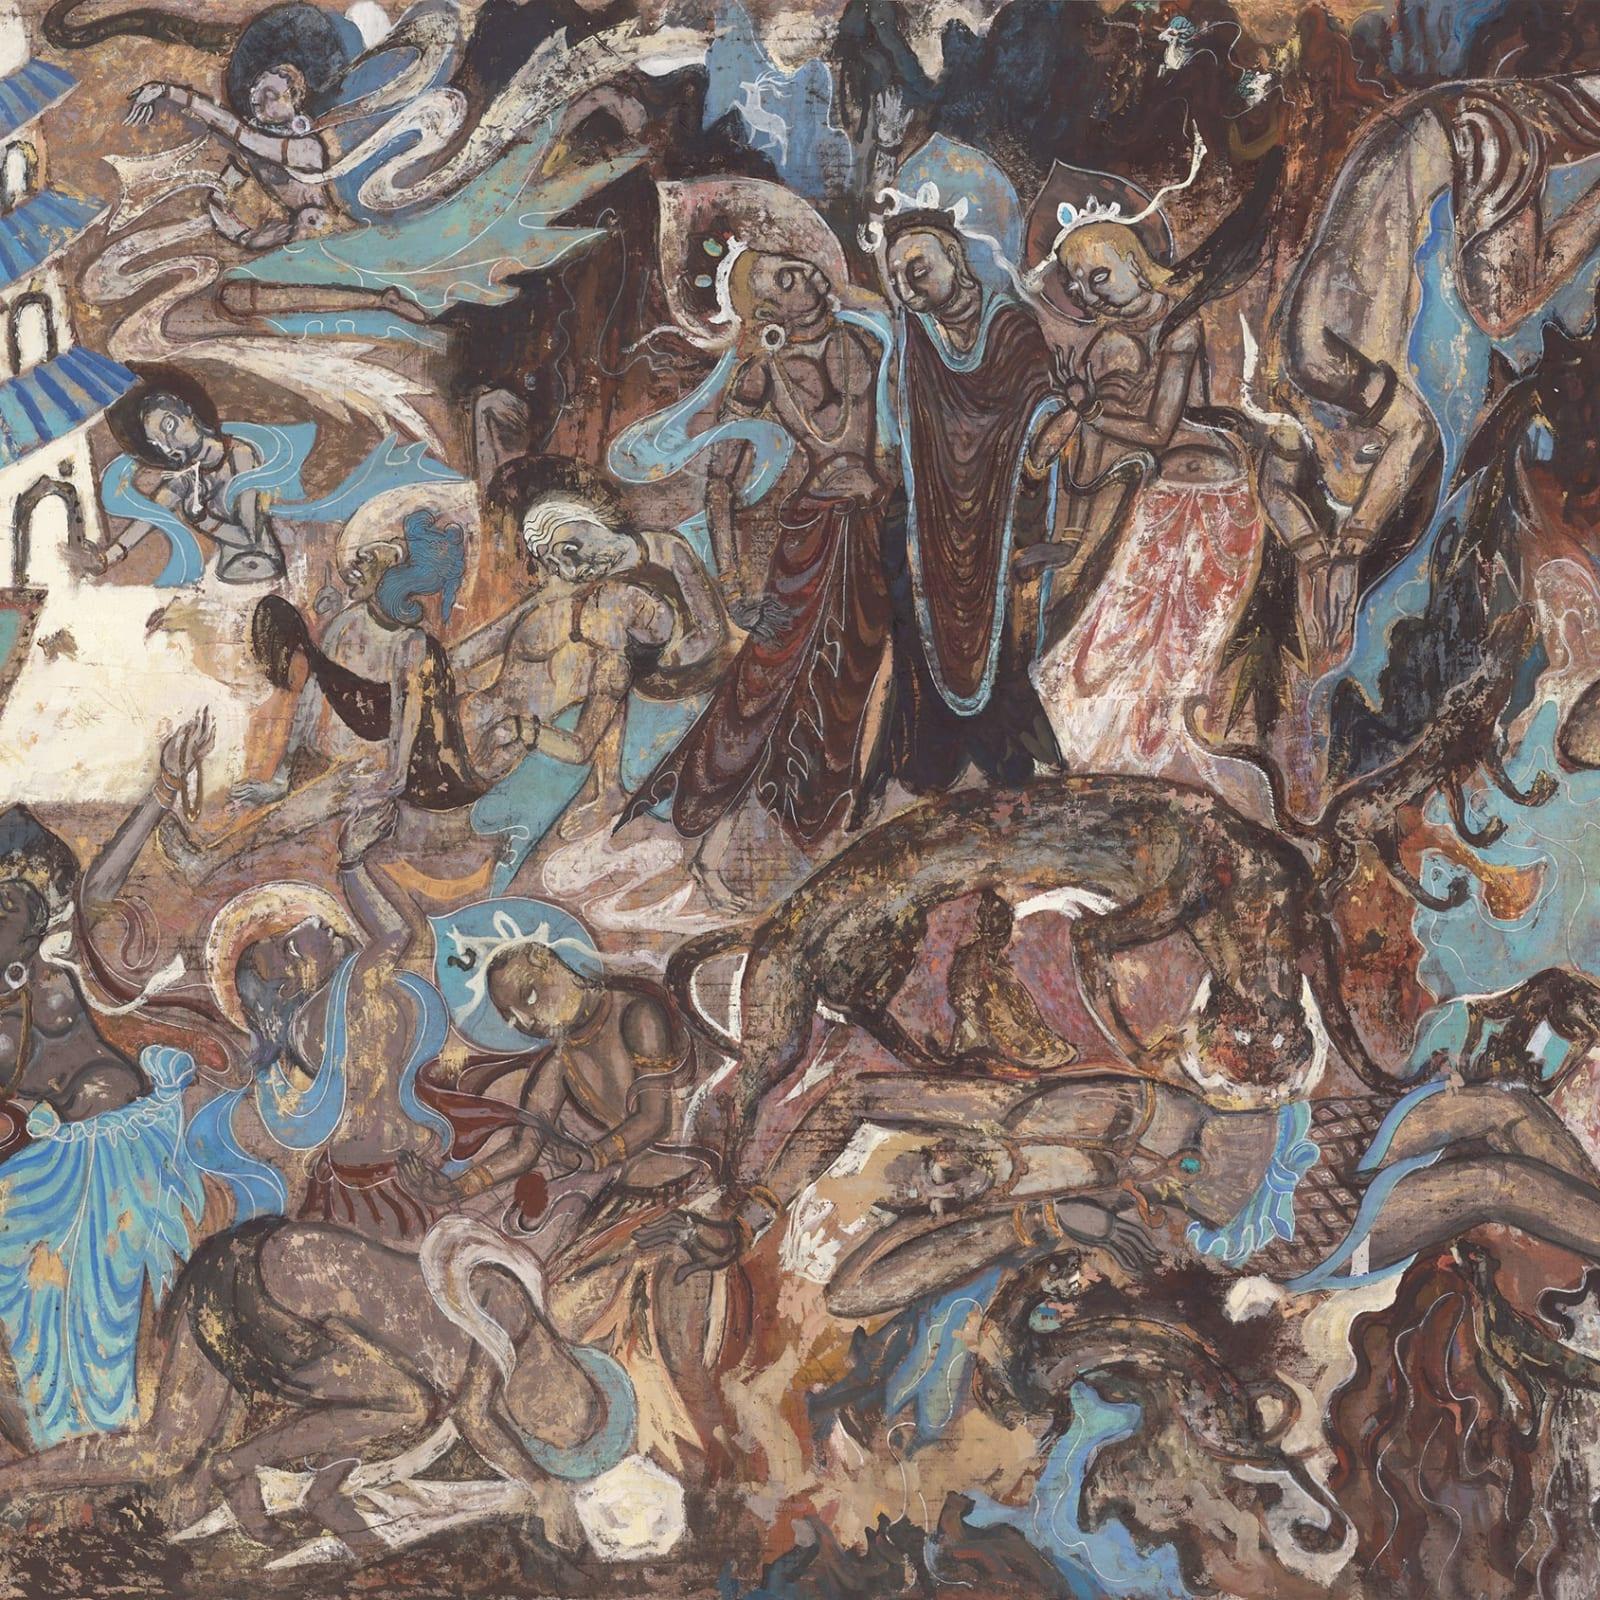 Li Jin 李津, The Hungry Tigress 舍身饲虎, 1981